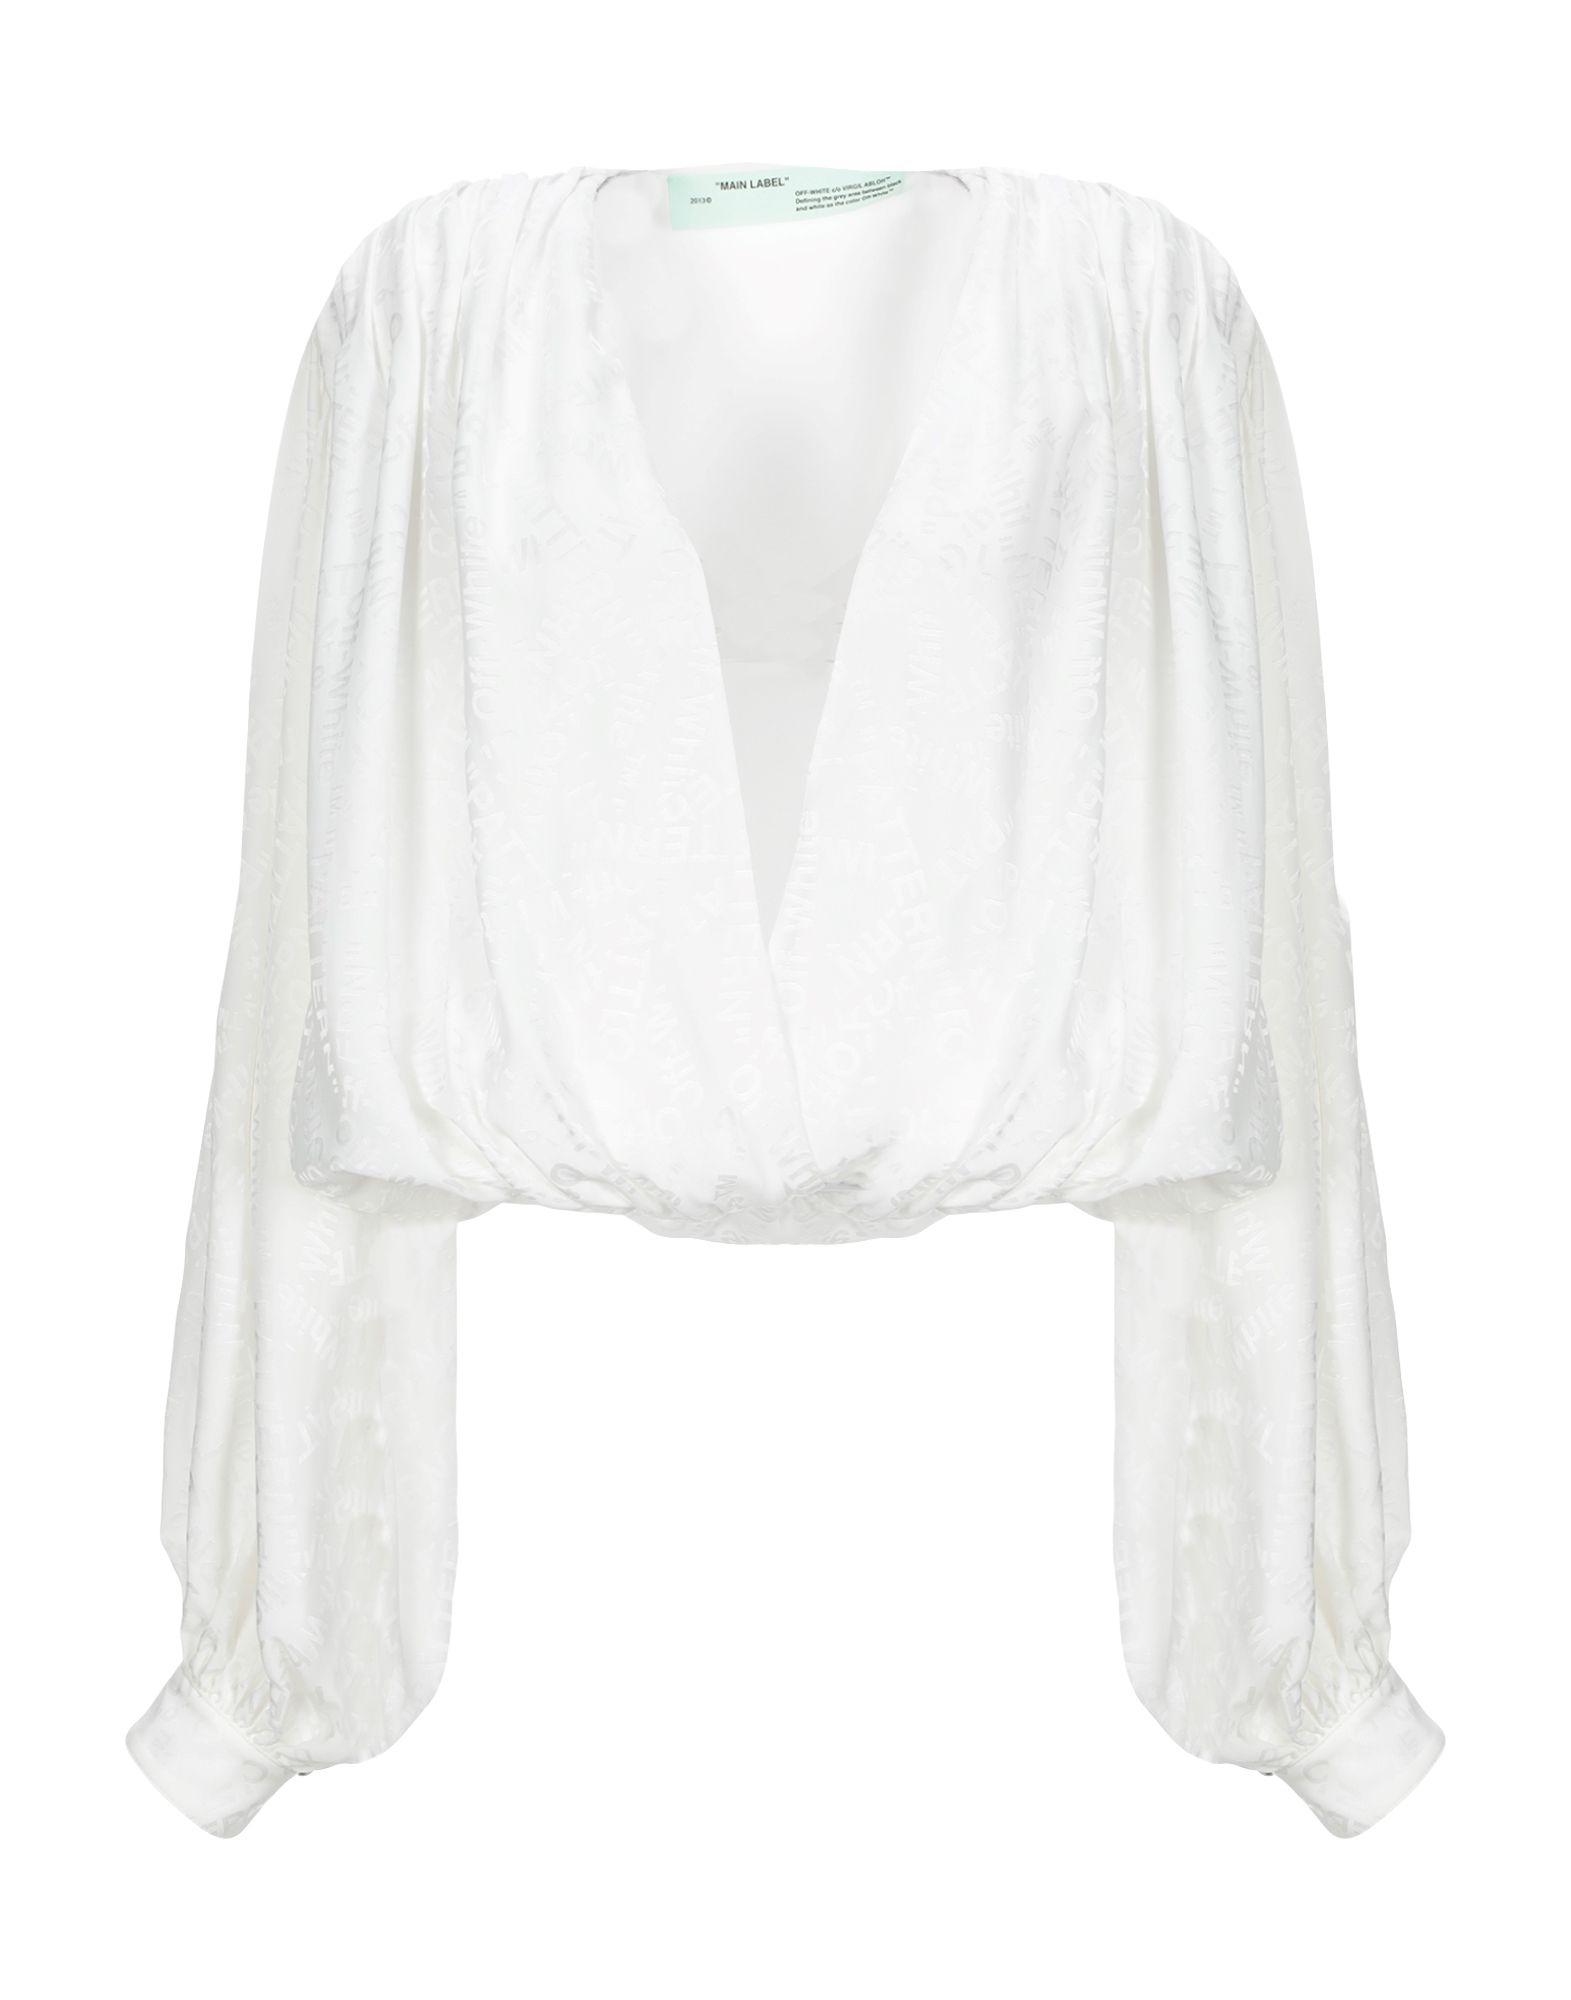 OFF-WHITE™ Blouses. crepe, no appliqués, basic solid color, long sleeves, deep neckline, no pockets. 73% Acetate, 27% Viscose